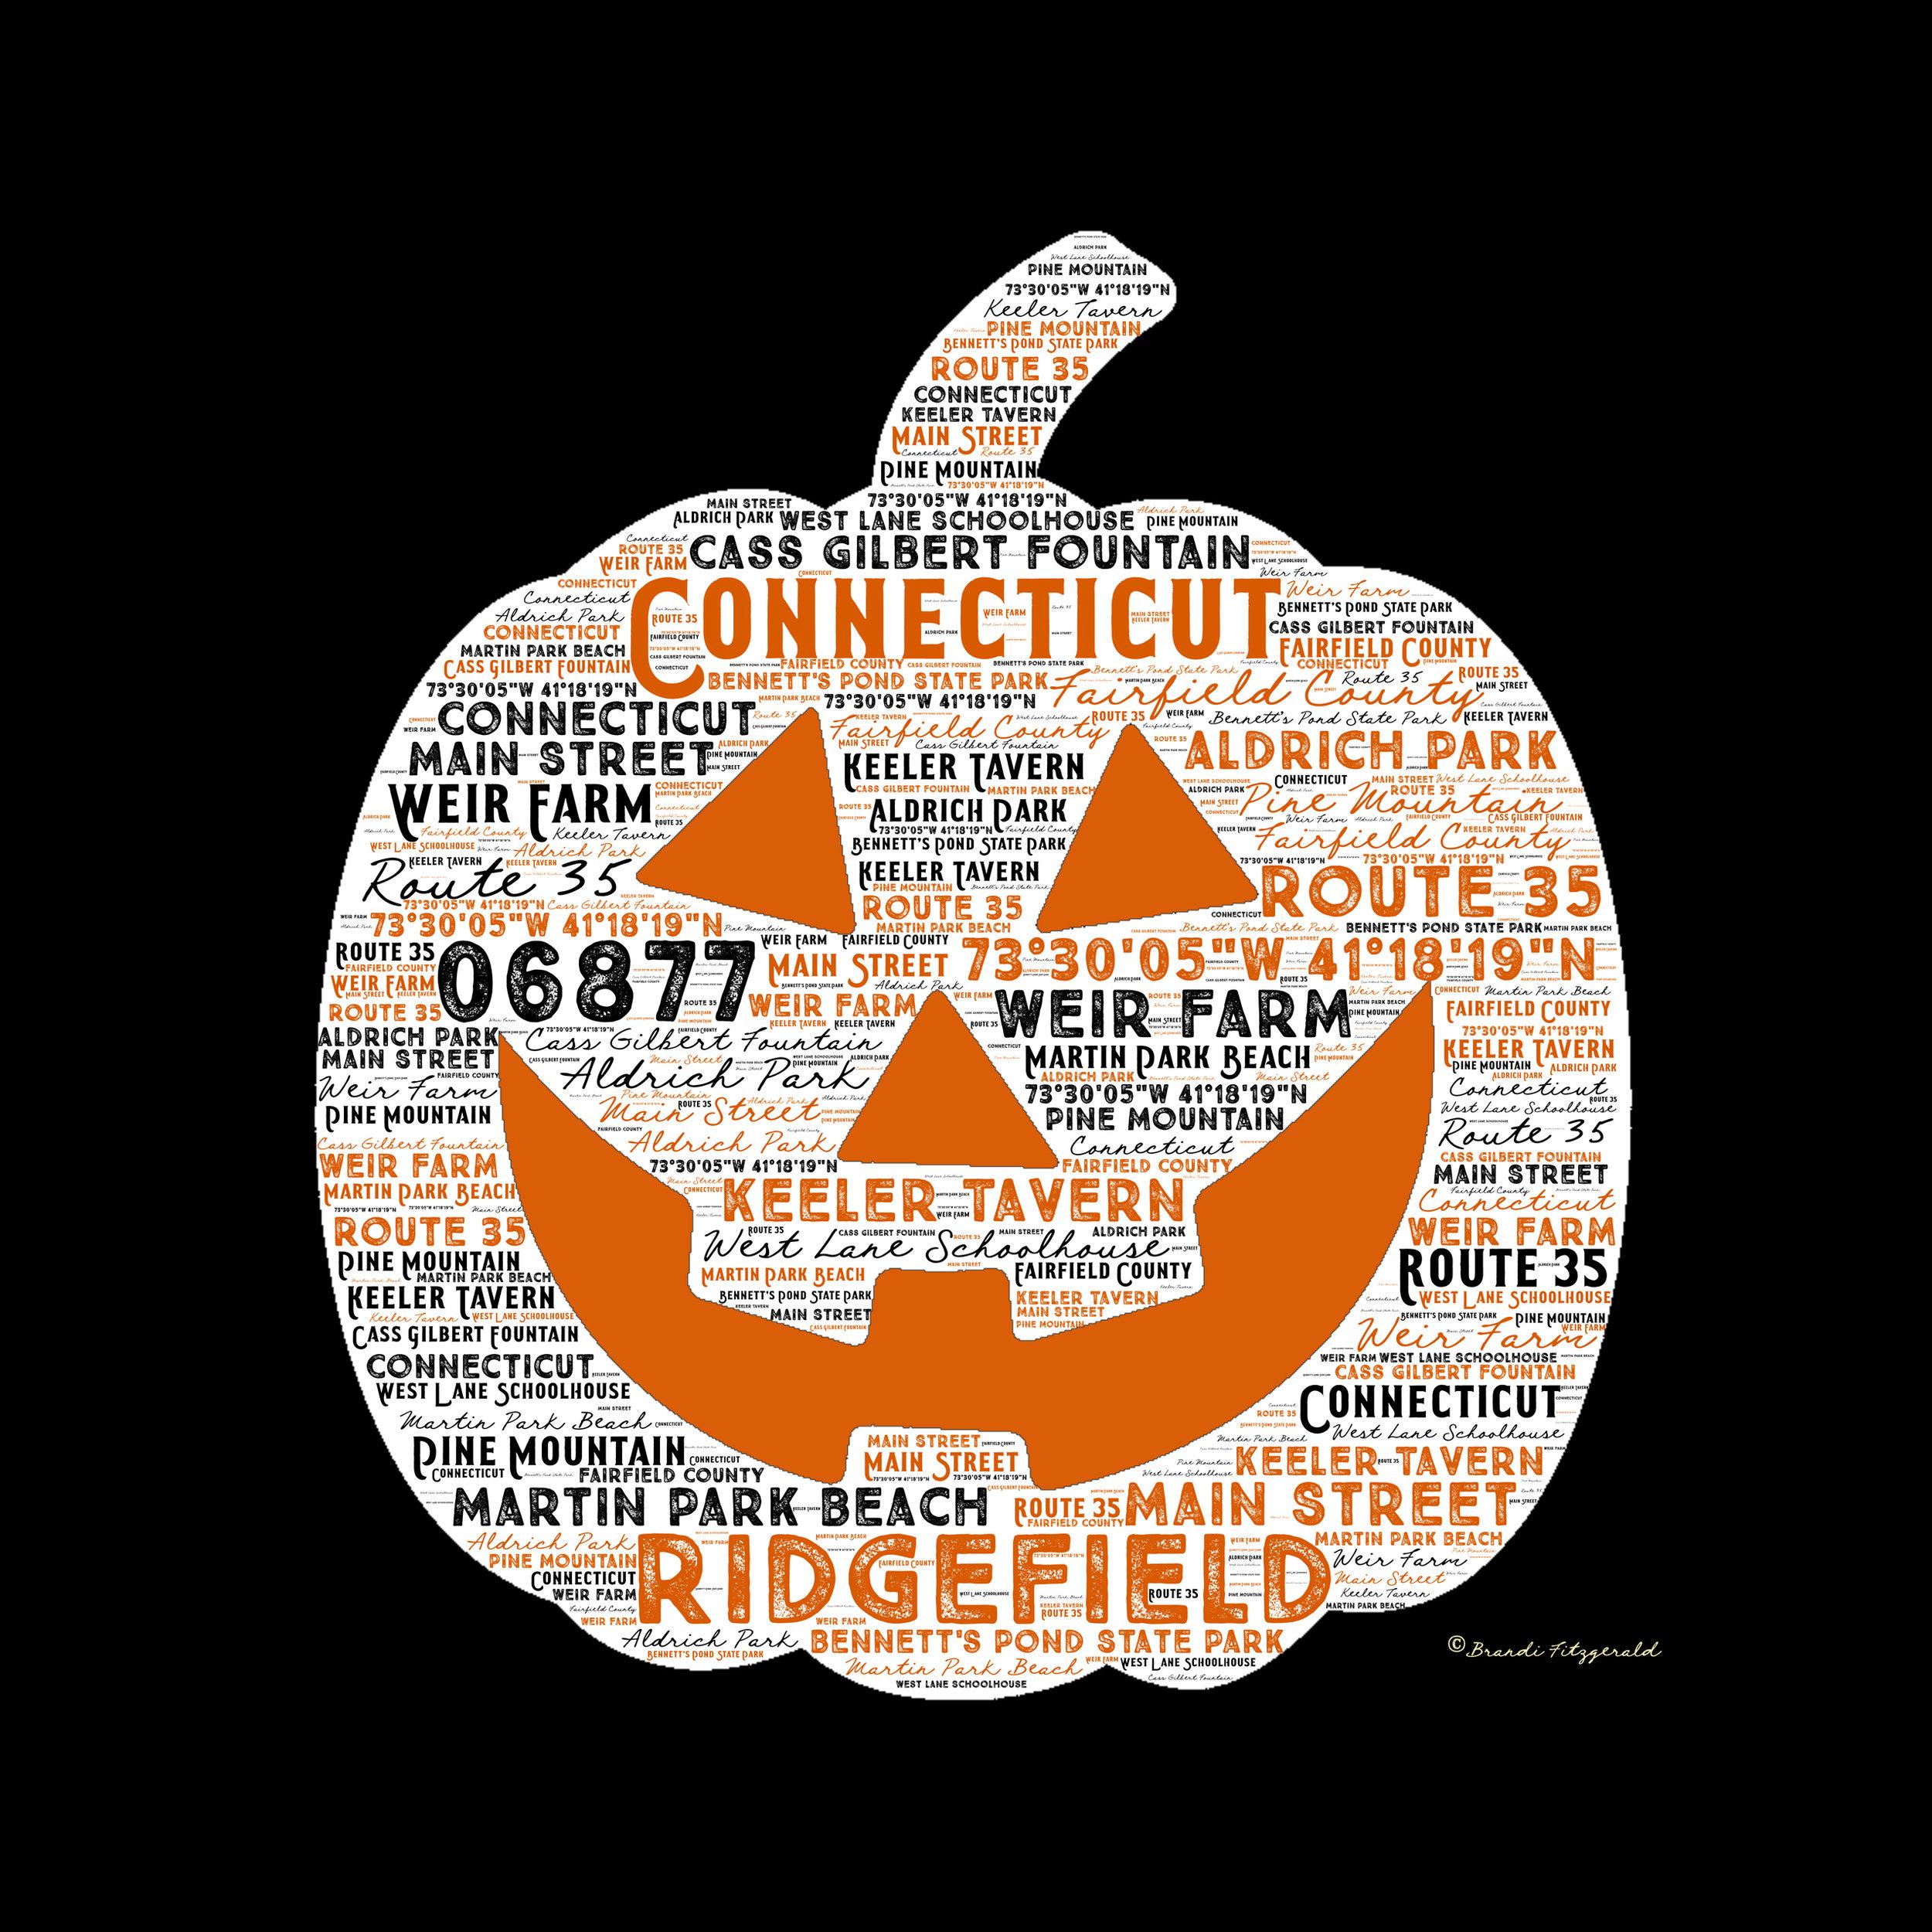 ABS_Ridgefield_Pumpkin2.jpg